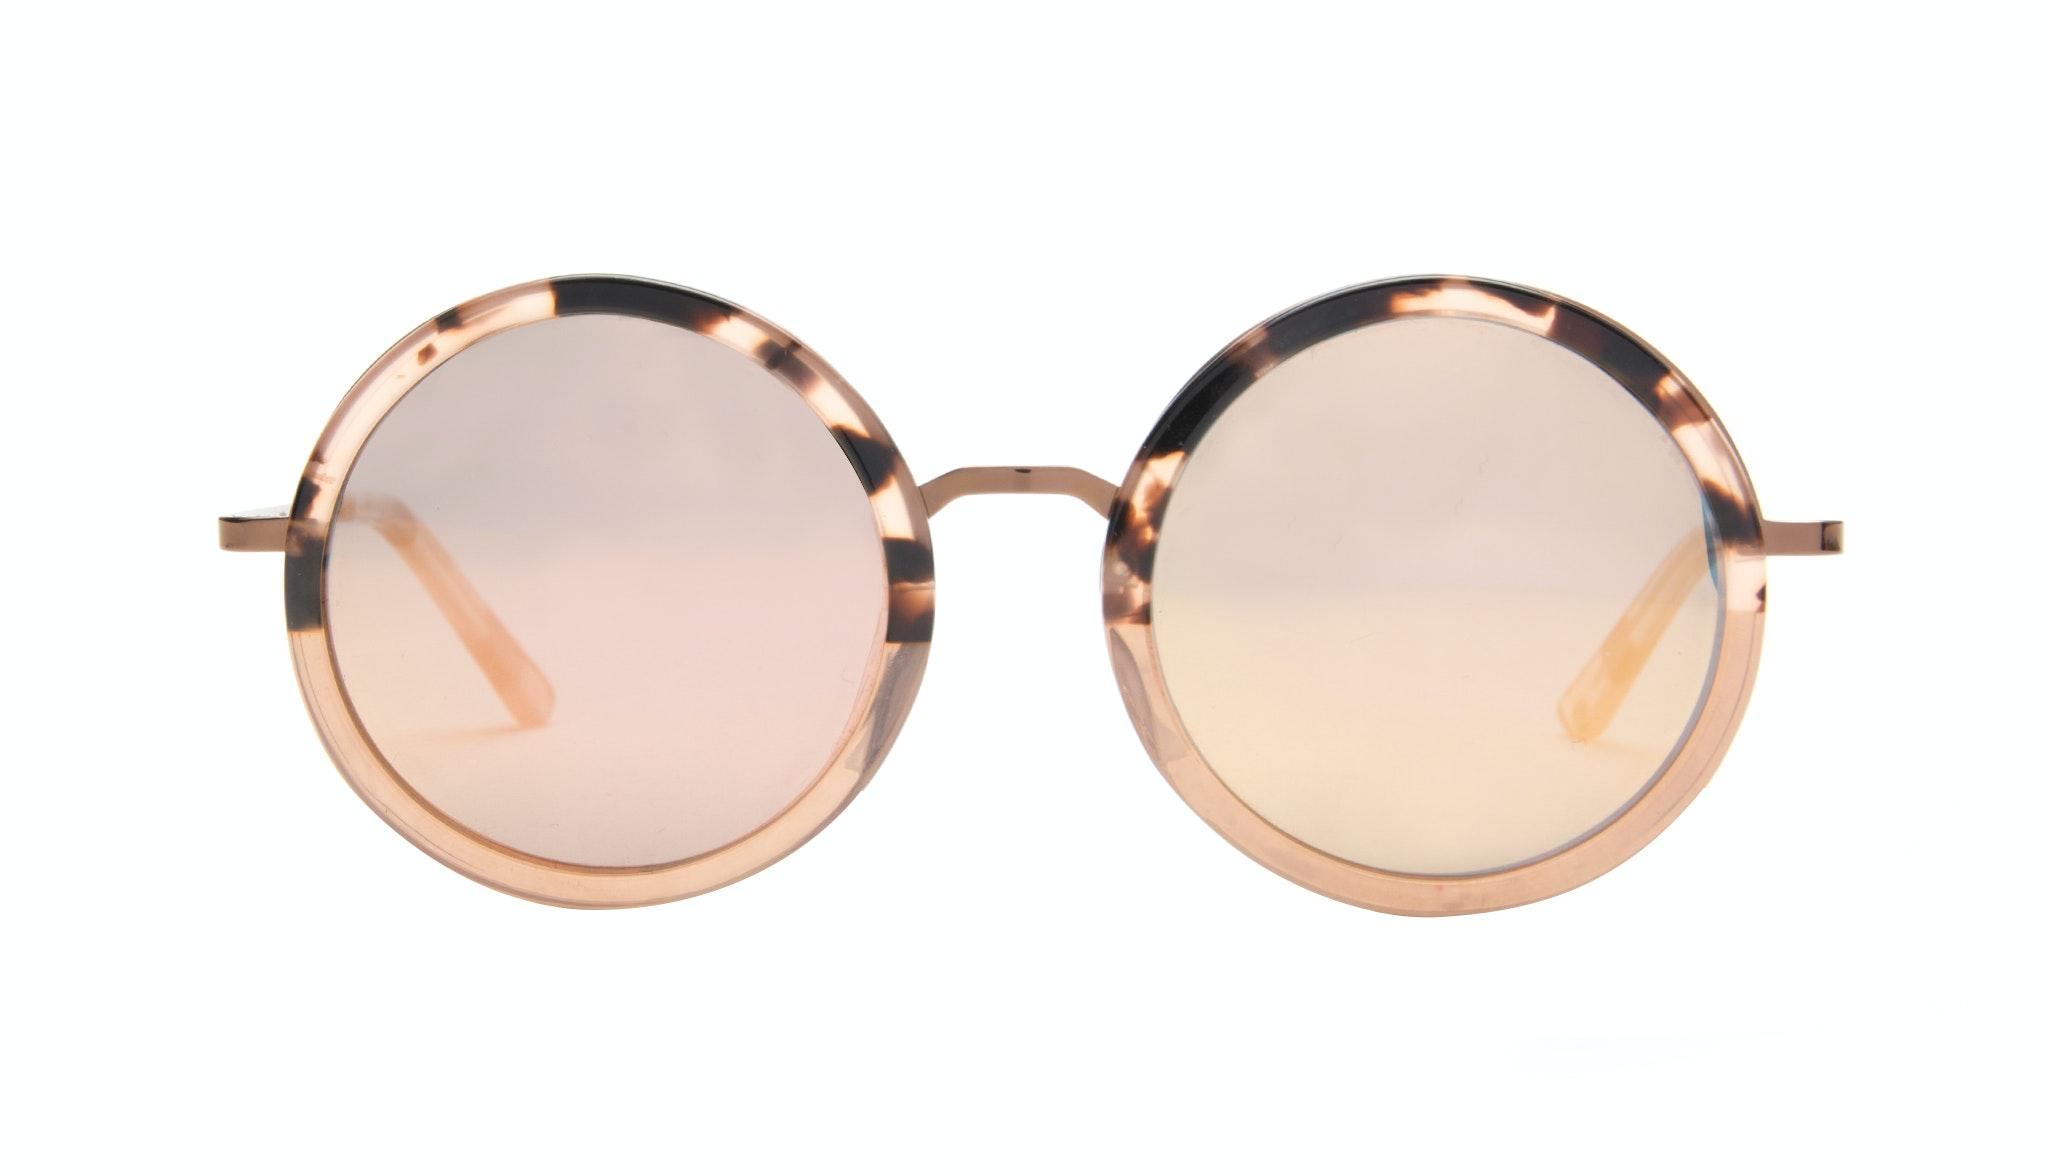 Affordable Fashion Glasses Round Sunglasses Women Balance Rose Tortoise